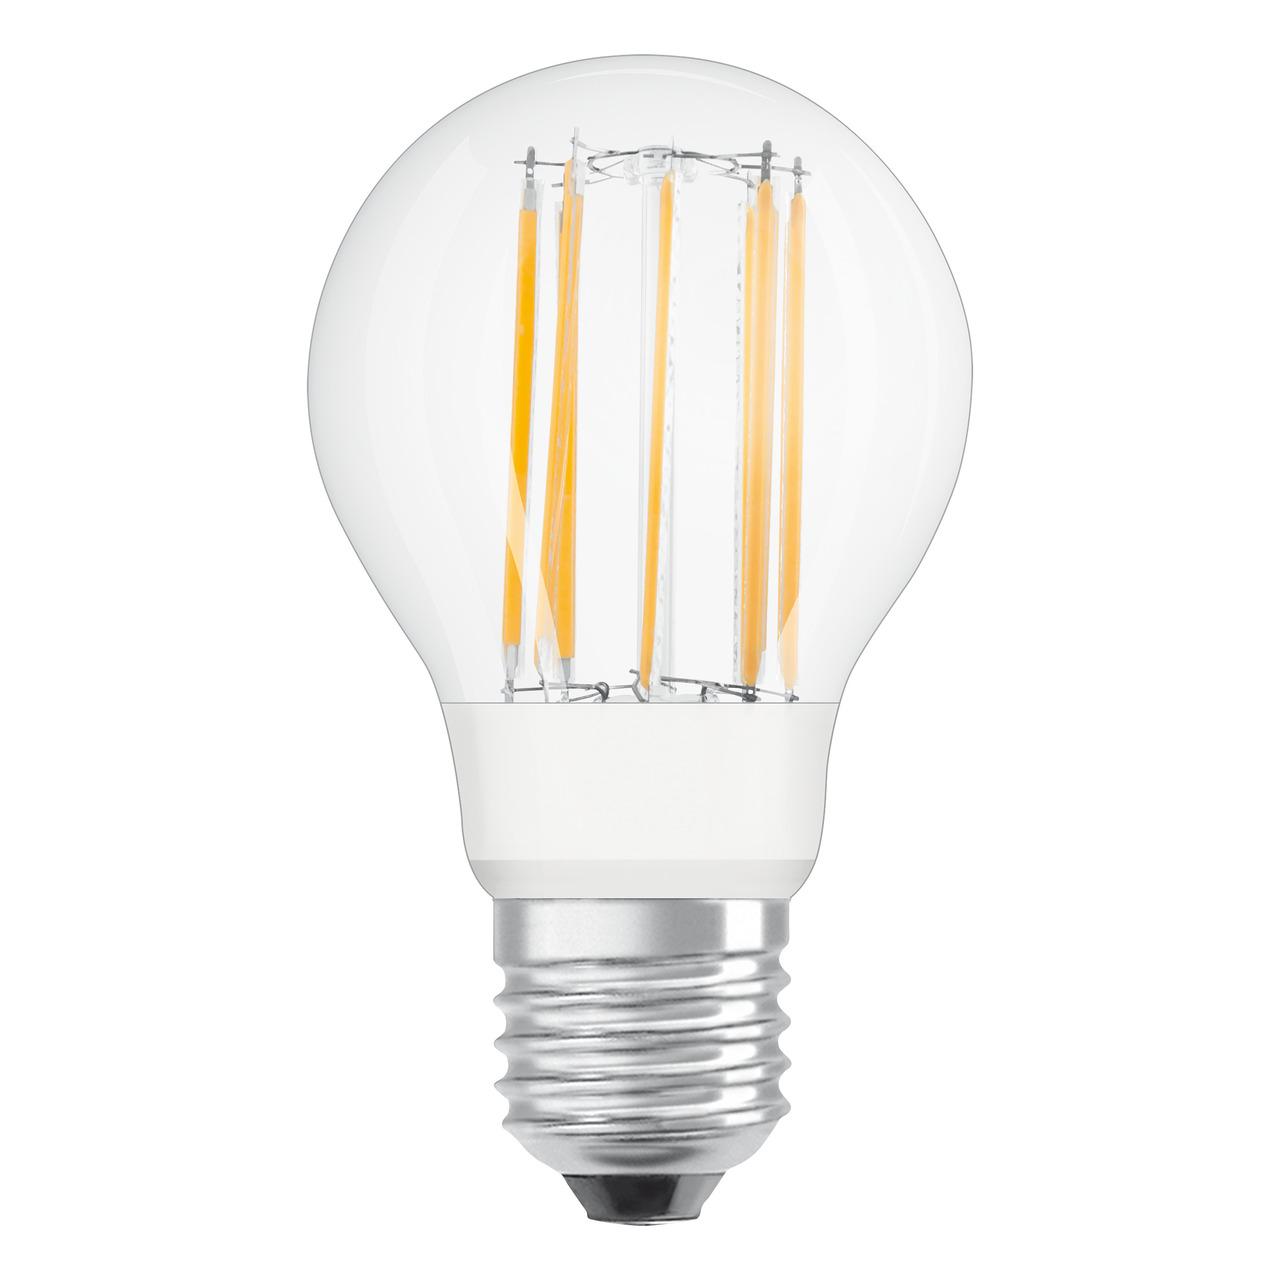 OSRAM LED Superstar 9-W-Filament-LED-Lampe E27- neutralweiss- klar- dimmbar- 1055 lm